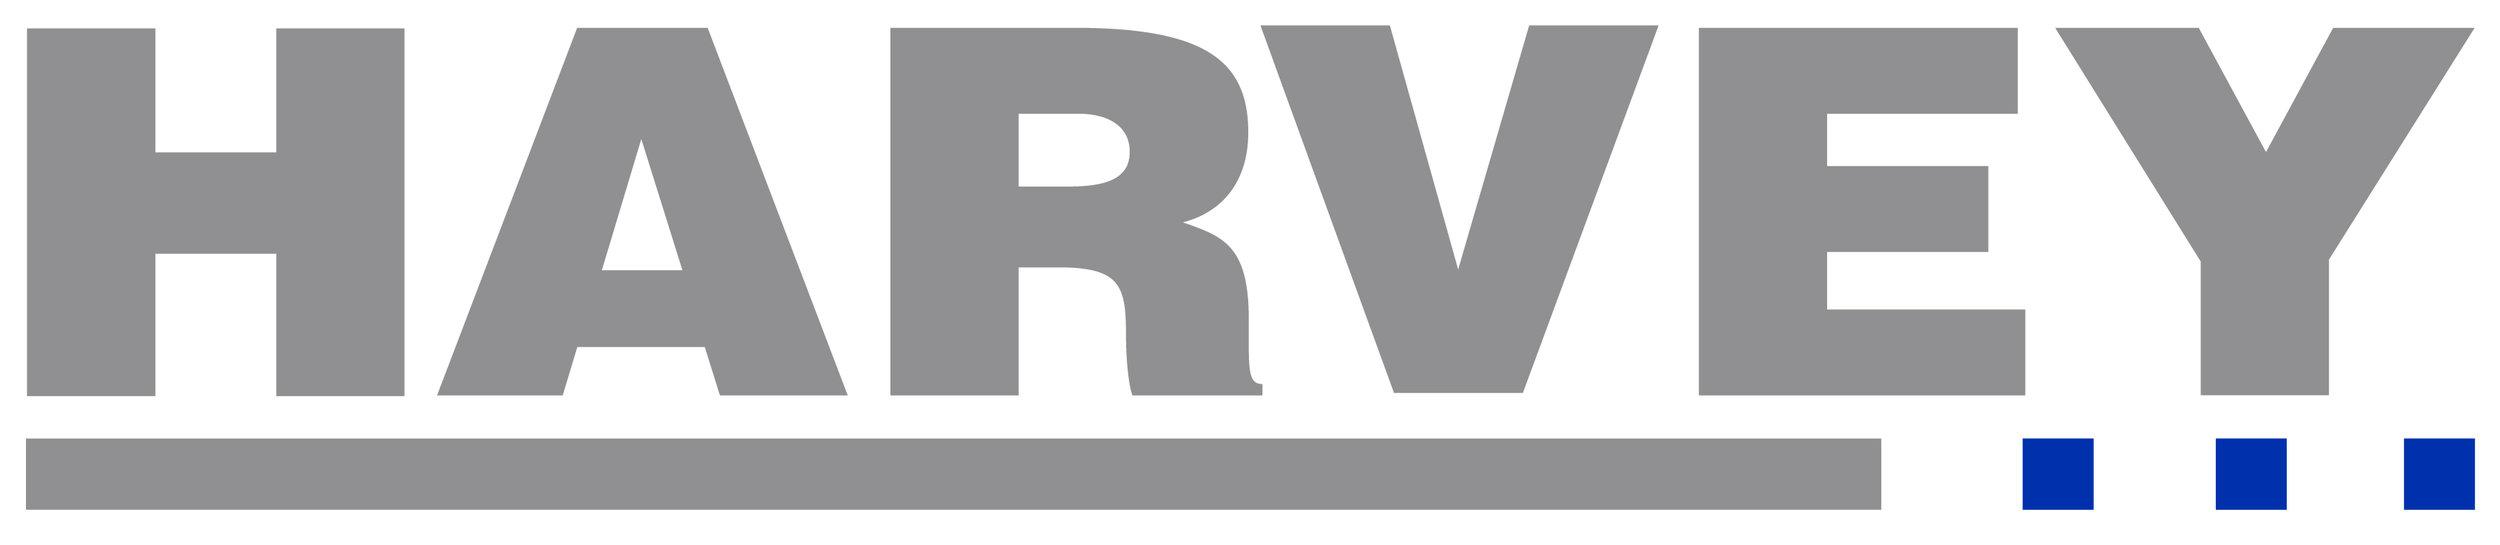 Harvey Promo Logo.jpg